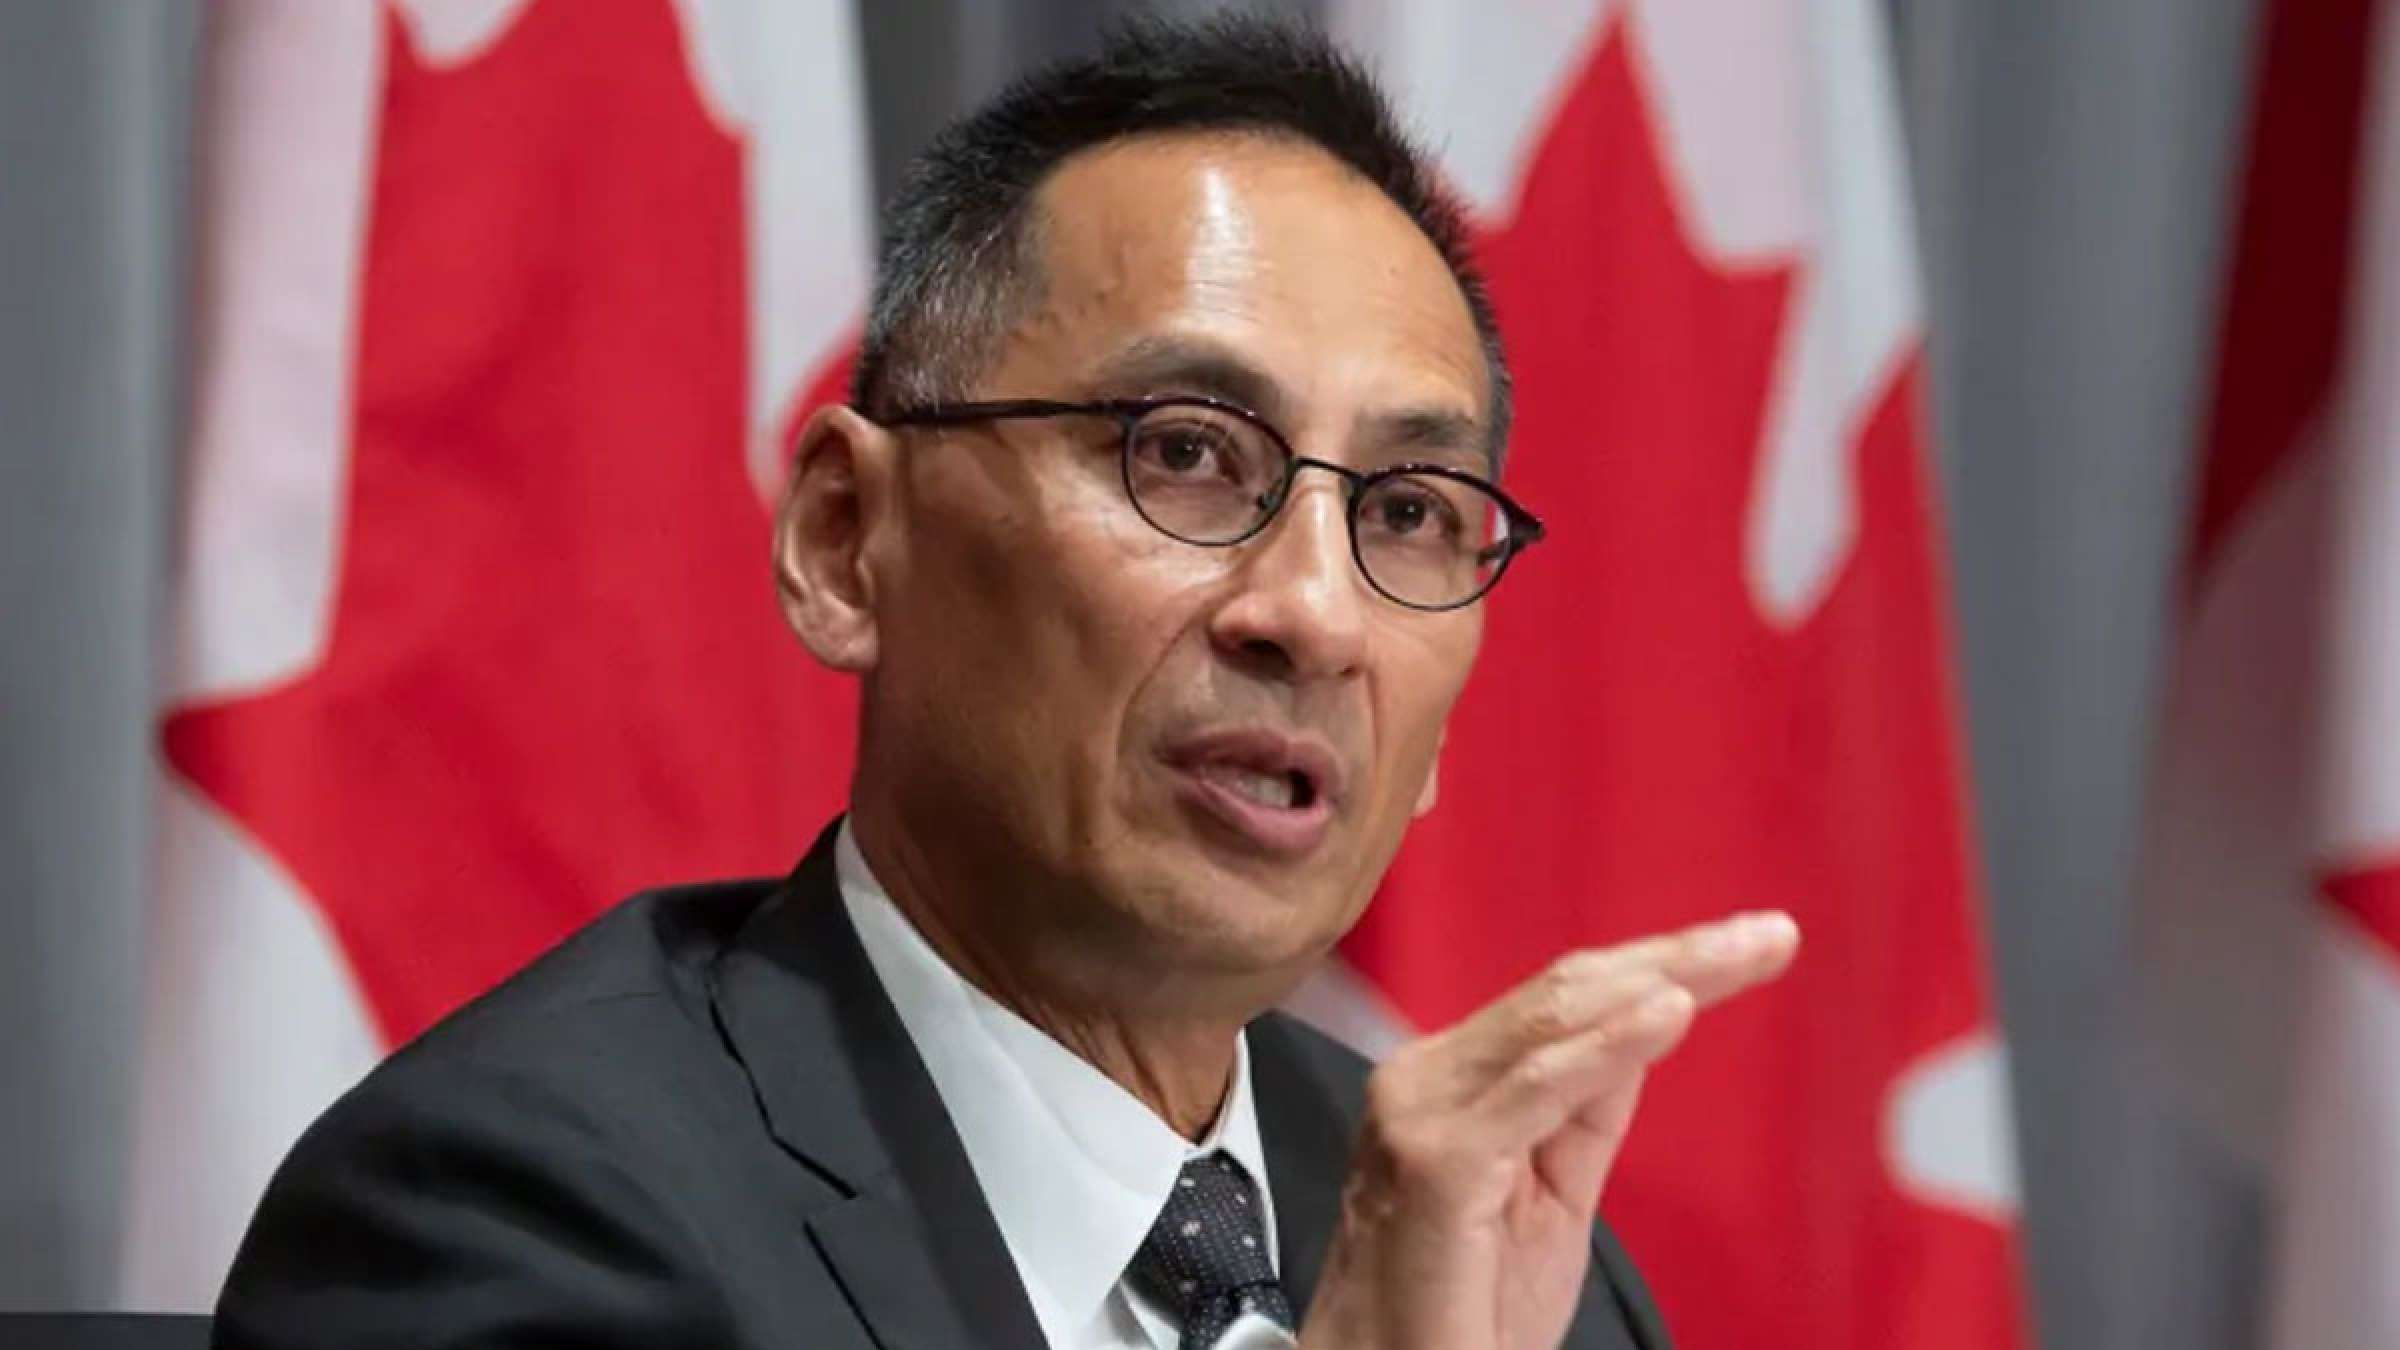 اخبار-کانادا-همه-کانادایی-ها-تا-پایان-سال-۲۰۲۱-علیه-کرونا-واکسینه-می-شوند